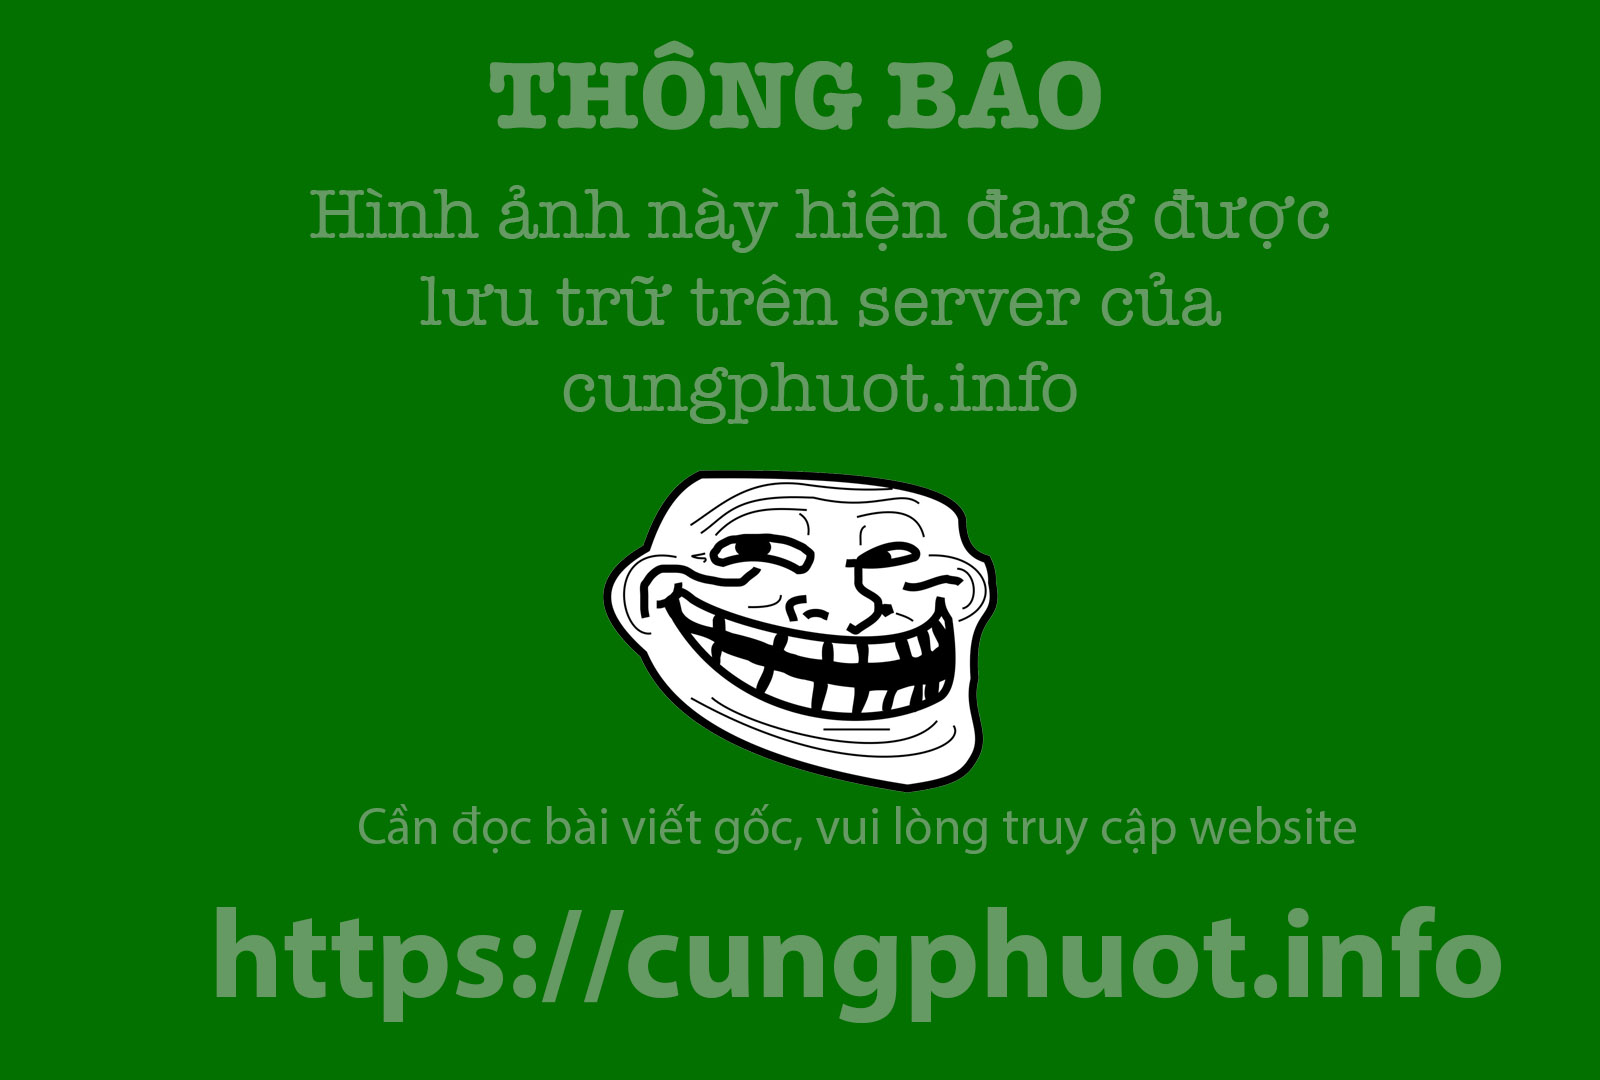 Dan phuot me man ve dep ky vi cua hang Prai o Quang Tri hinh anh 8